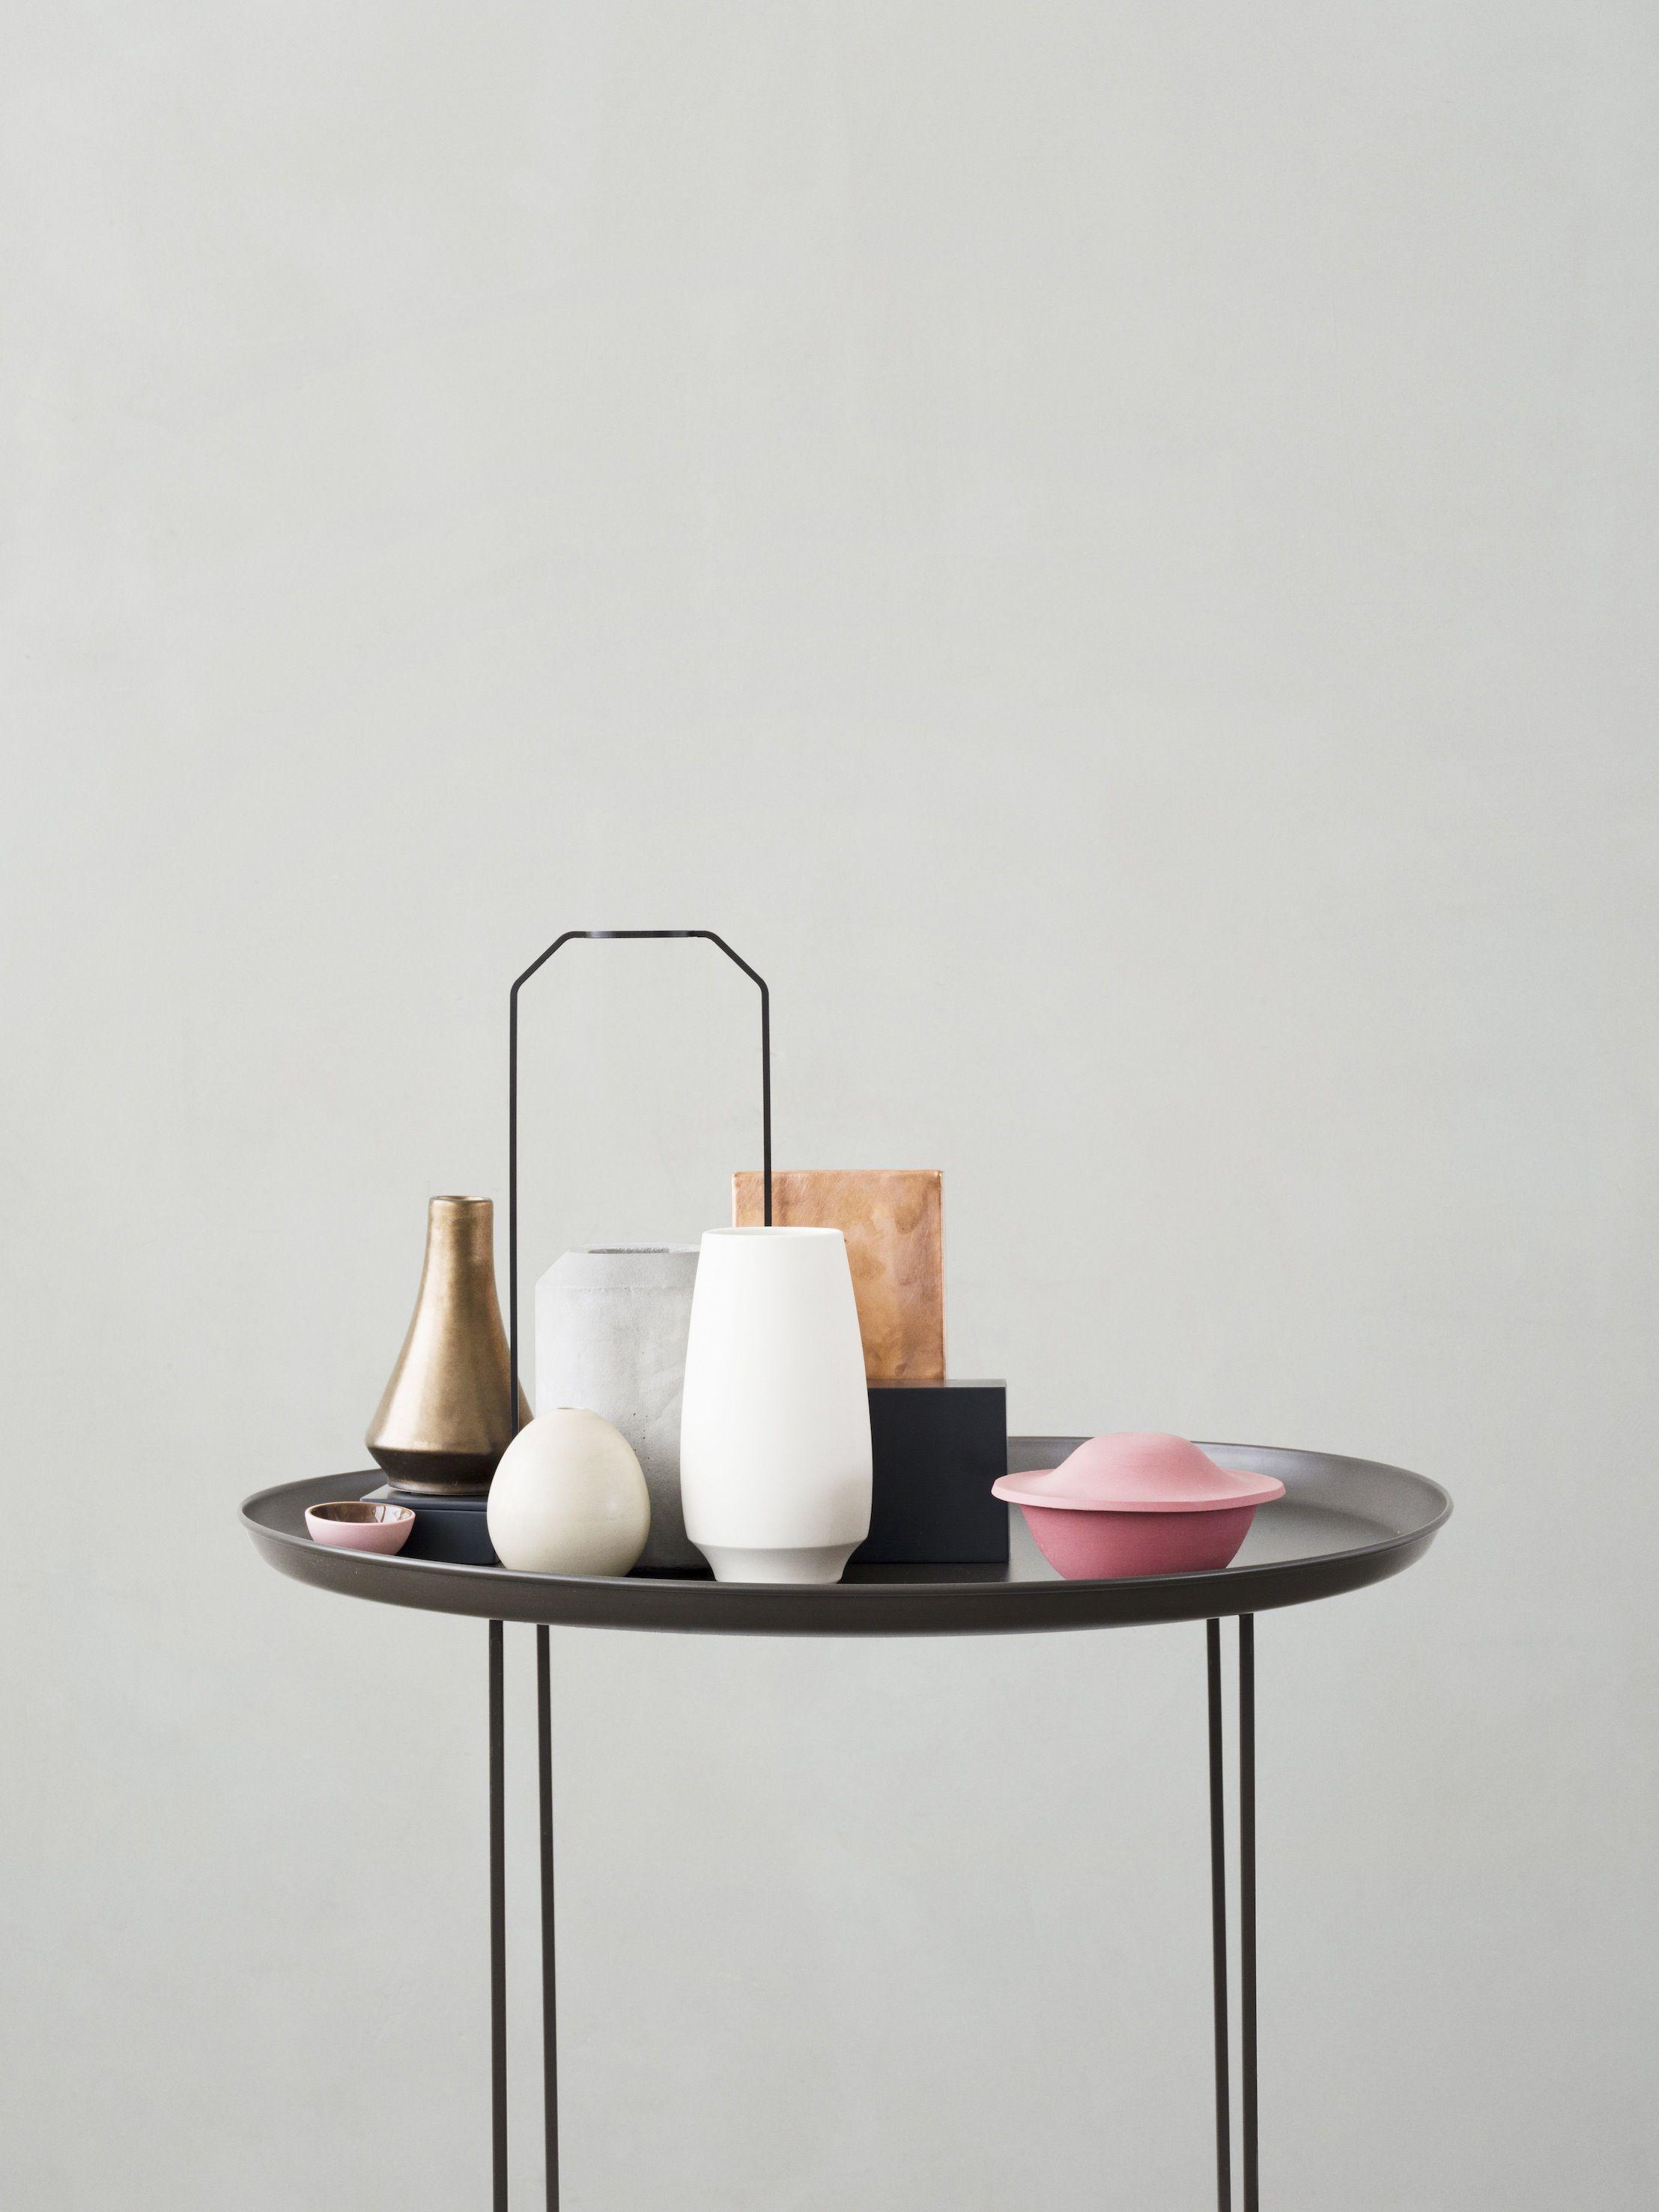 Pin by Renato Japi on Objetos | Pinterest | Nordic interior ...